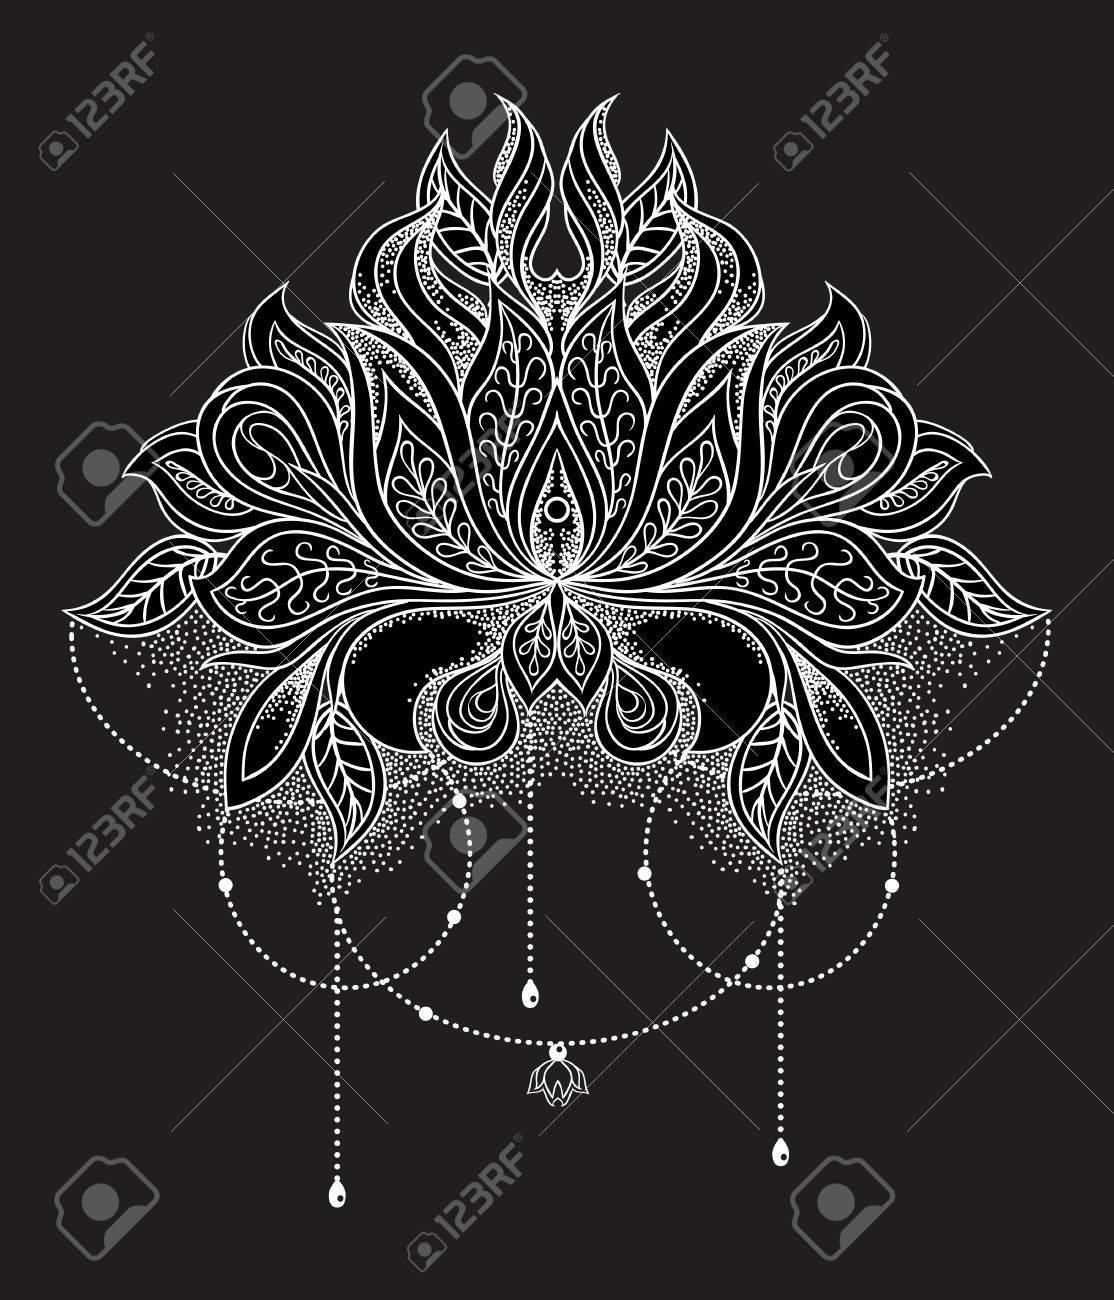 Dibujado A Mano Hermoso Flor De Loto Ornamental Mandala Patrón